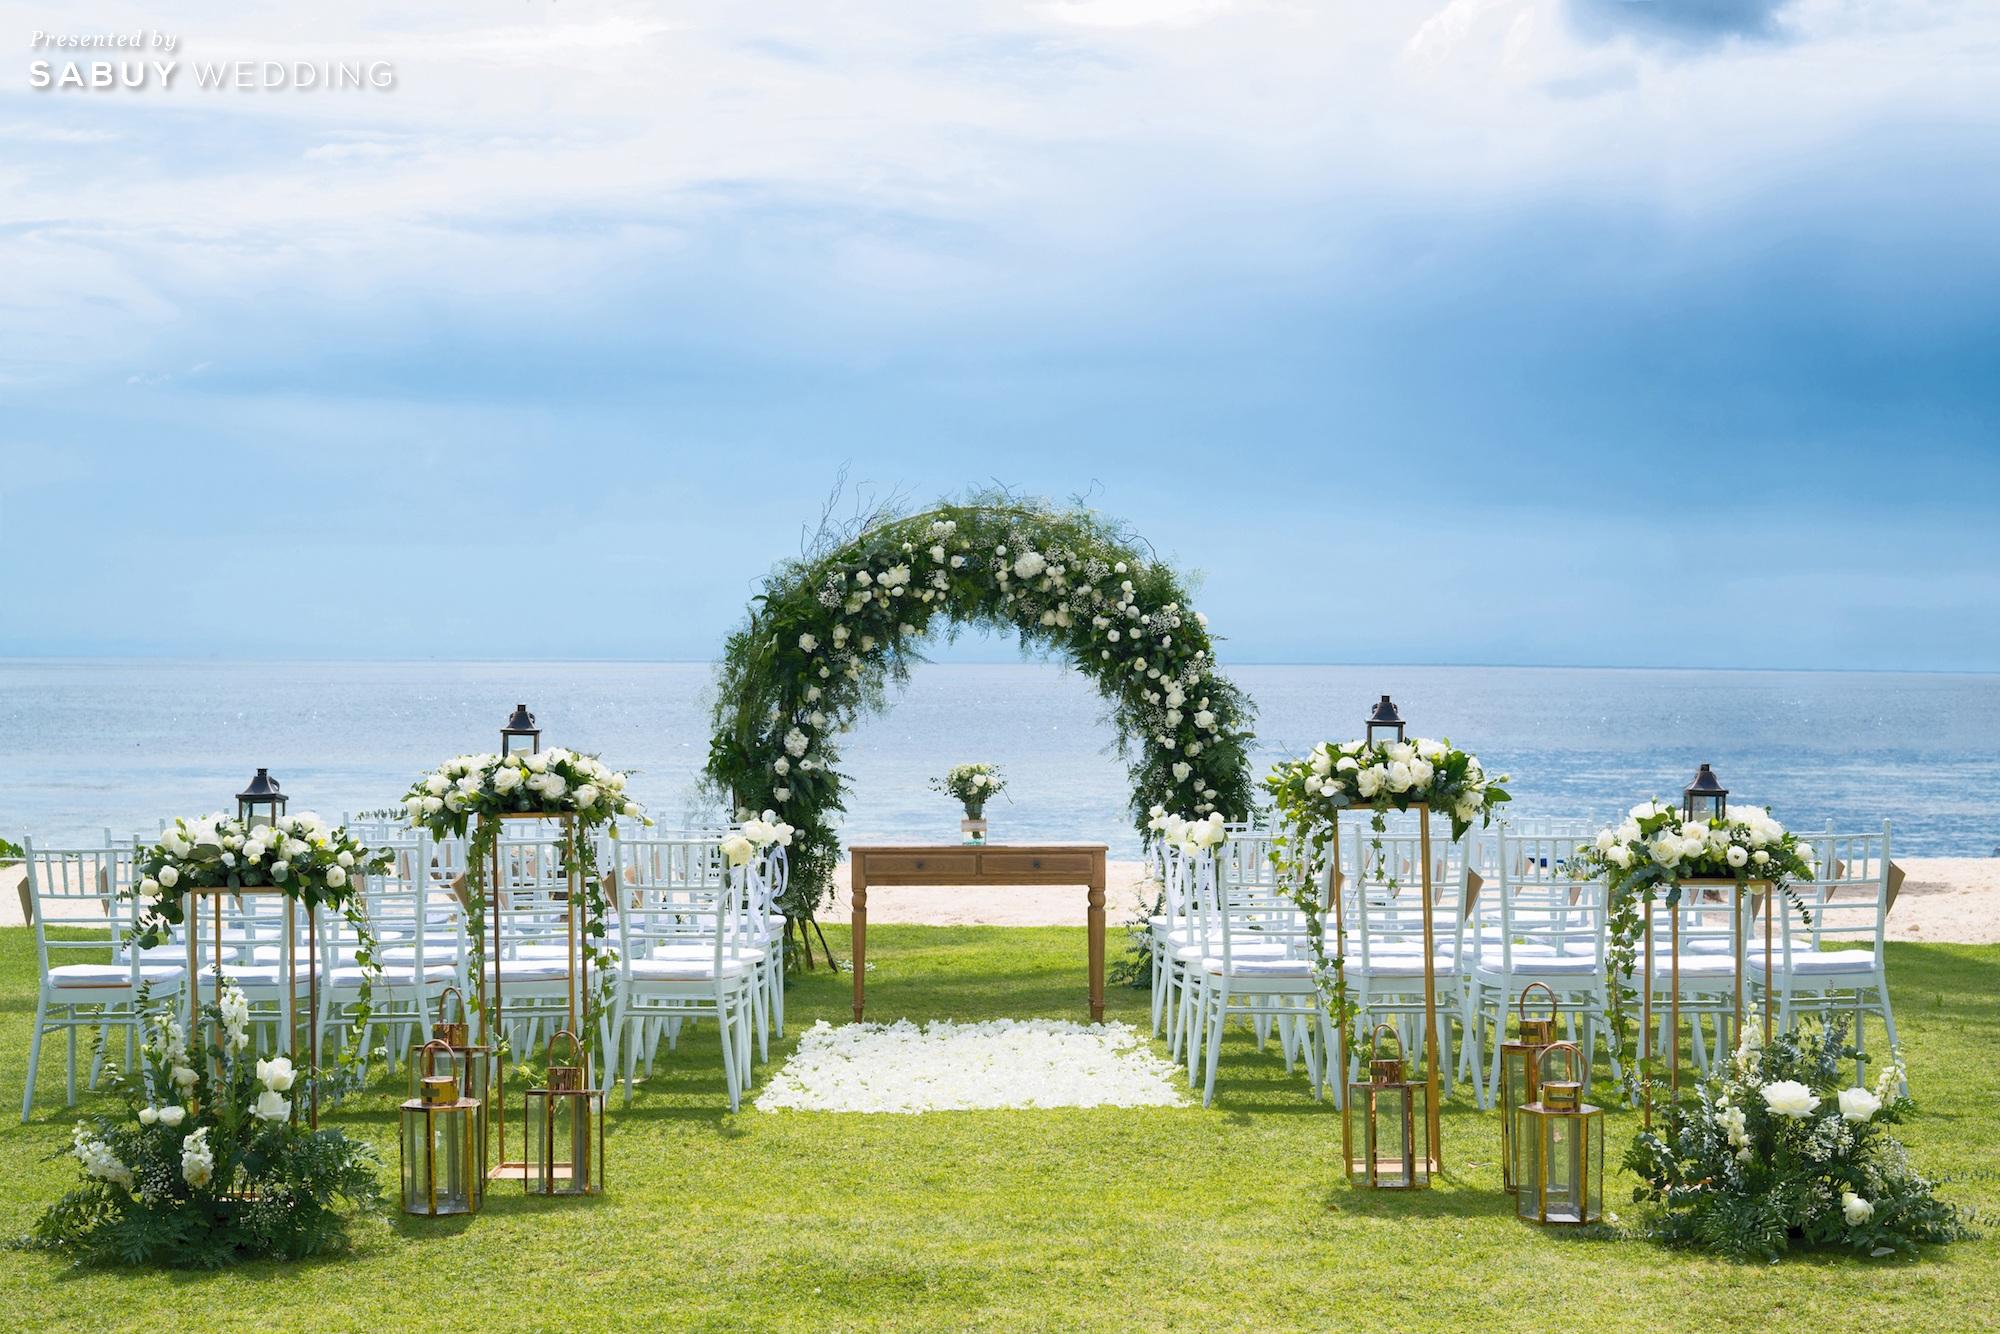 PHUKET MARRIOTT RESORT & SPA, MERLIN BEACH,Marriott Wedding Thailand,แมริออท ประเทศไทย,สถานที่แต่งงาน,สถานที่จัดงานแต่งงาน,โรงแรม,งานแต่งงาน,งานแต่ง outdoor,งานแต่งริมทะเล,งานแต่งชายทะเล,งานแต่งในสวน ครบทุกความต้องการของบ่าวสาว กับ 40 สถานที่แต่งงานในเครือ Marriott